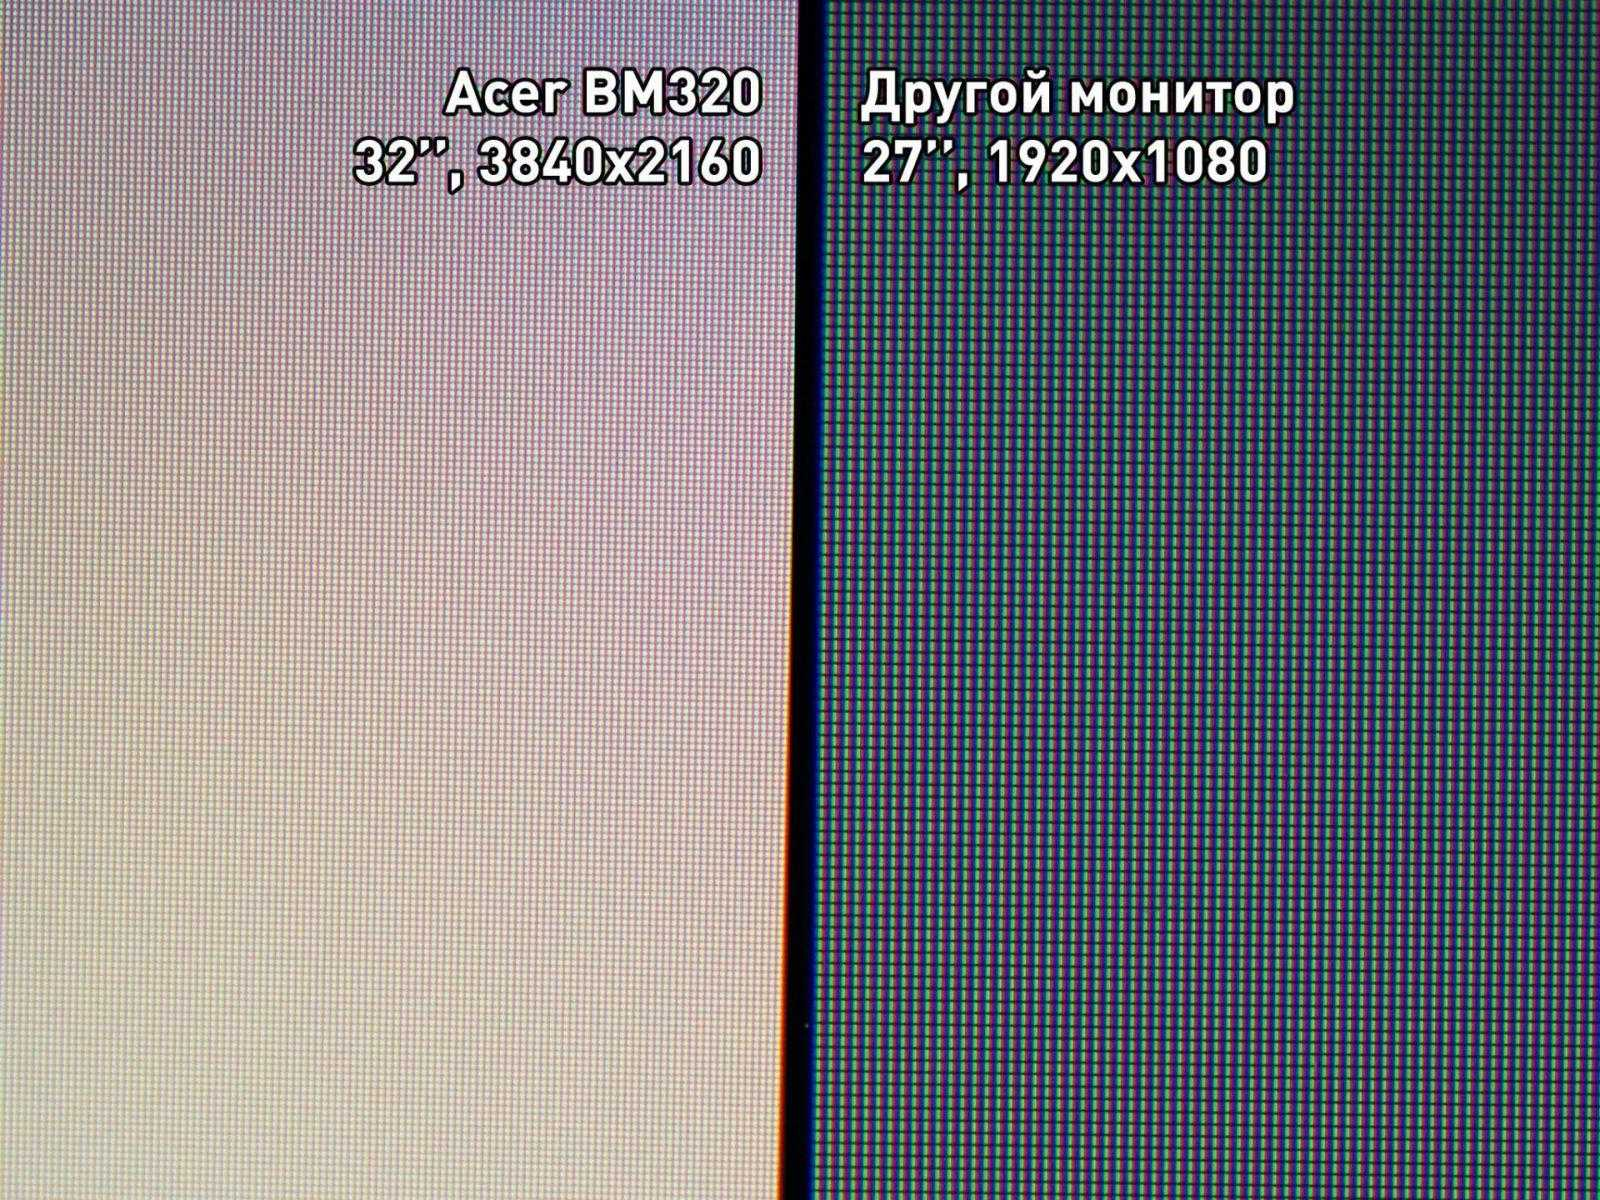 acer 320YaM26 - Обзор монитора Acer ProDesigner BM320